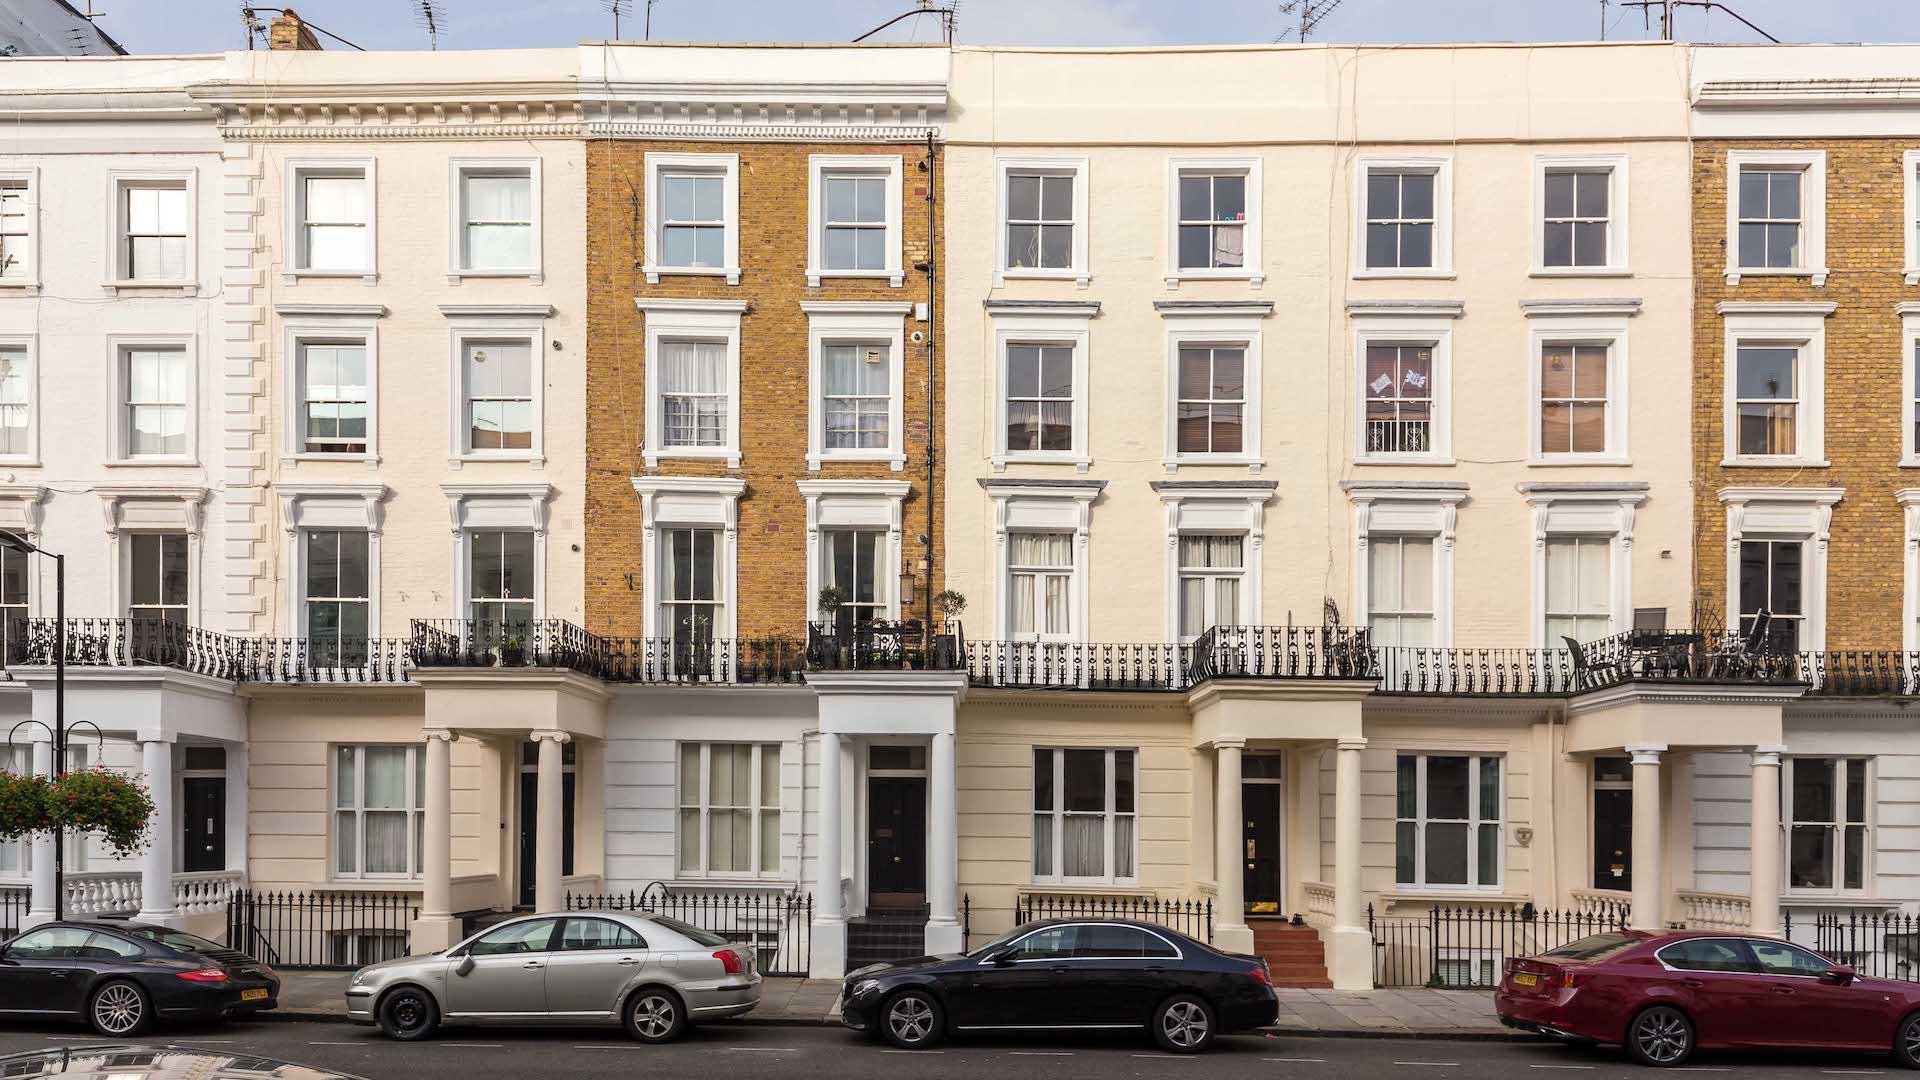 Four story terraced house with sand-coloured bricks, London.